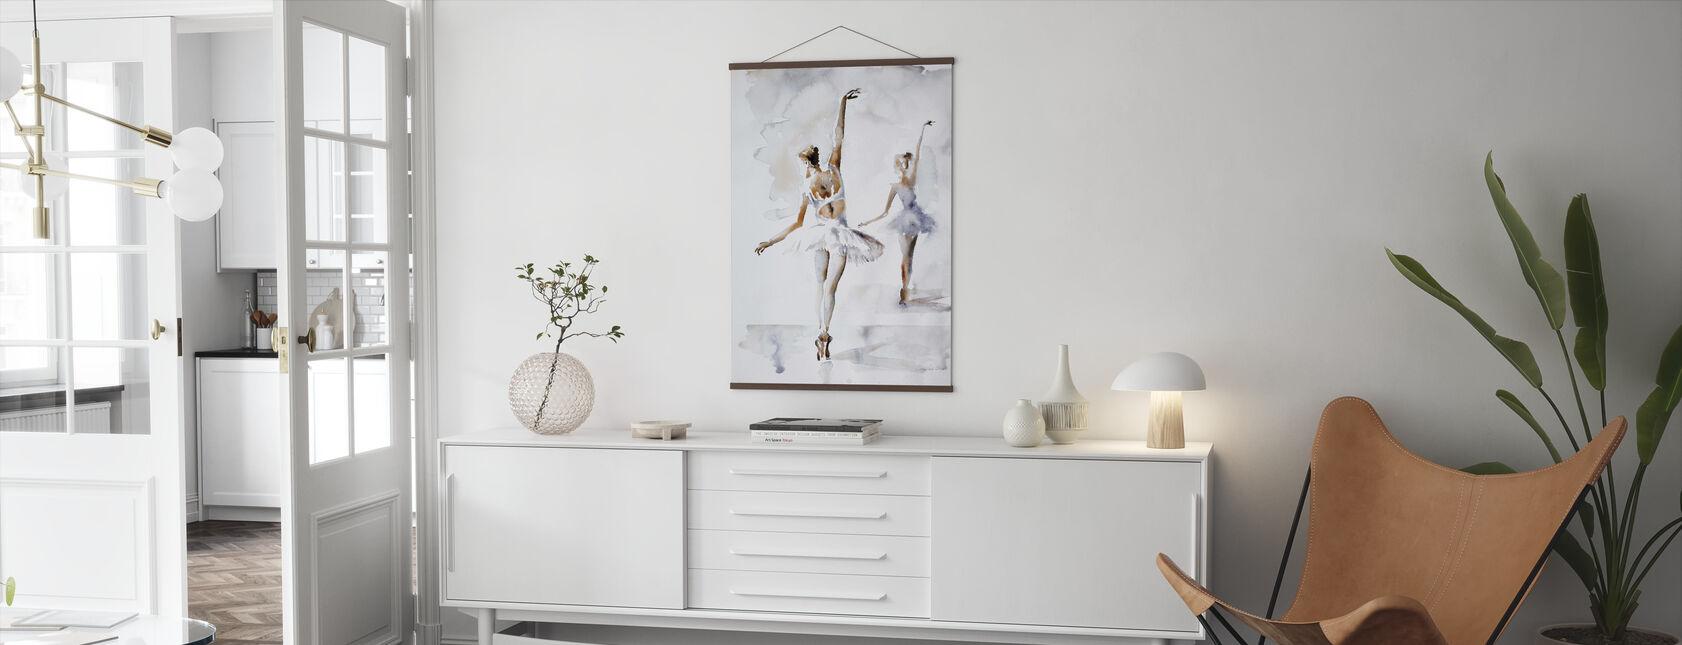 Ballerina In Blauw - Poster - Woonkamer